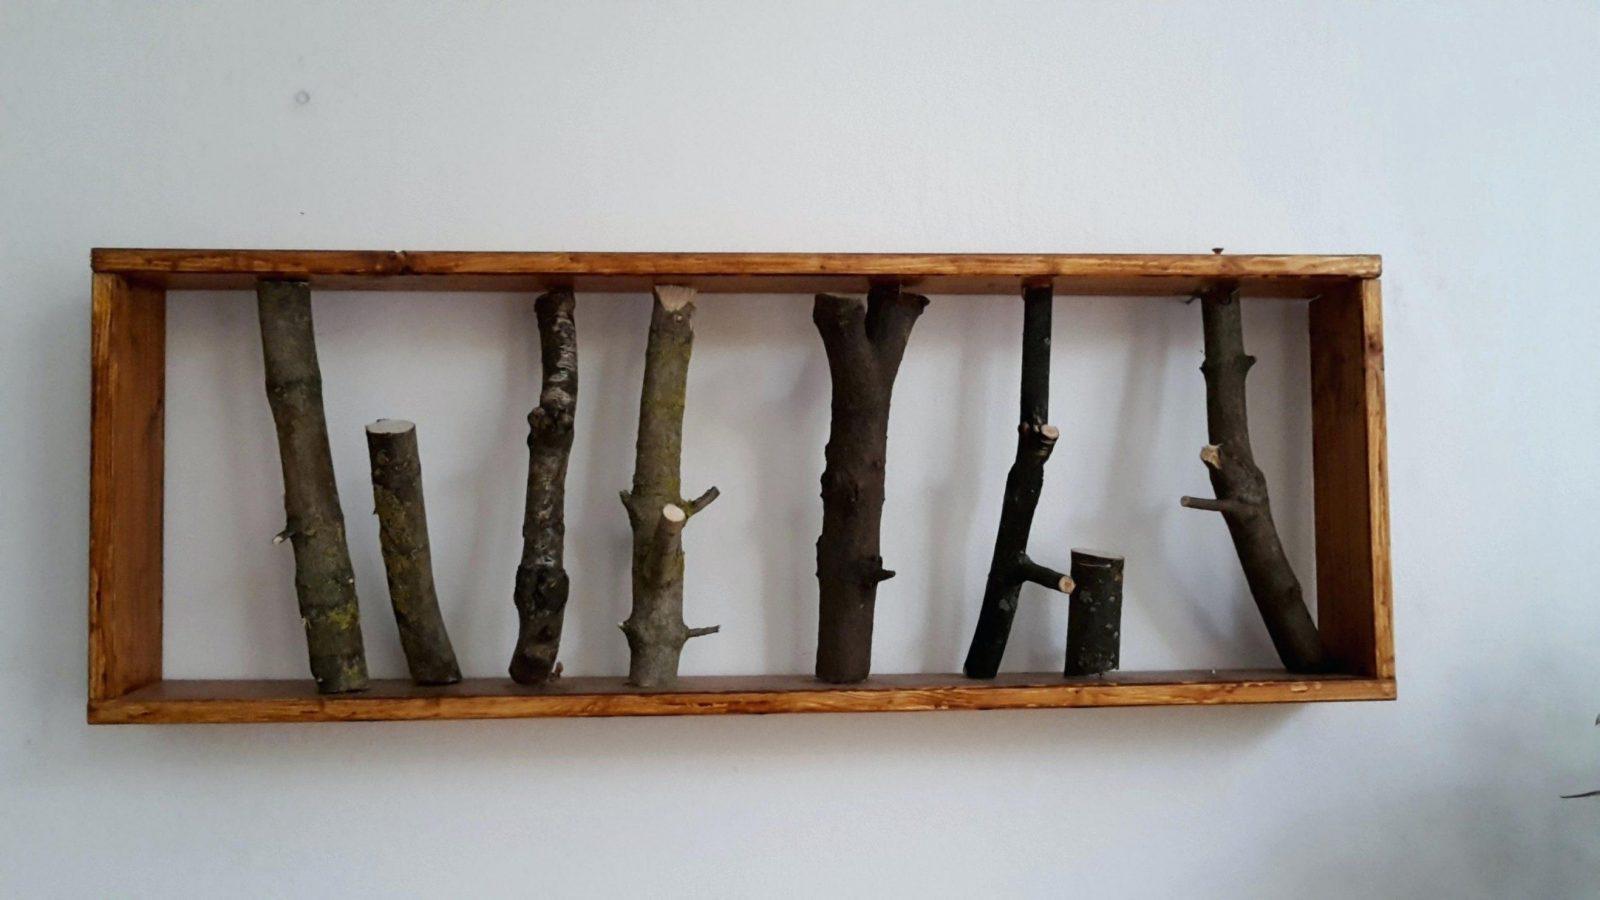 Wandgarderobe Selber Bauen 31 Kreative Ideen Fa 1 4 R Garderobe Im von Garderobe Selber Bauen Baum Bild